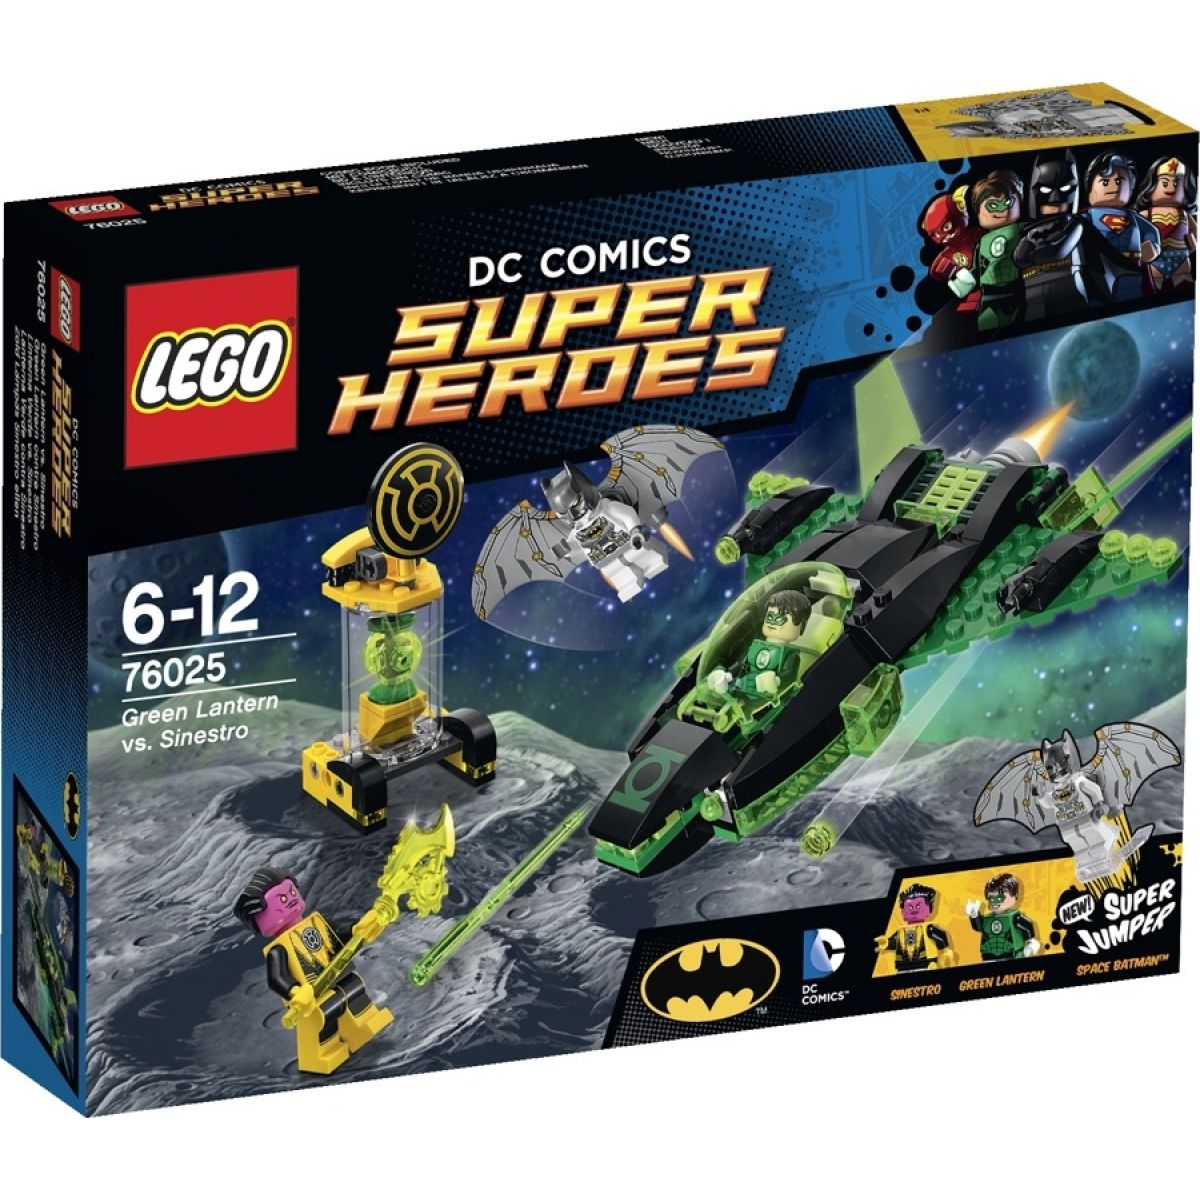 LEGO Super Heroes 76025 Green Lantern vs. Sinestro